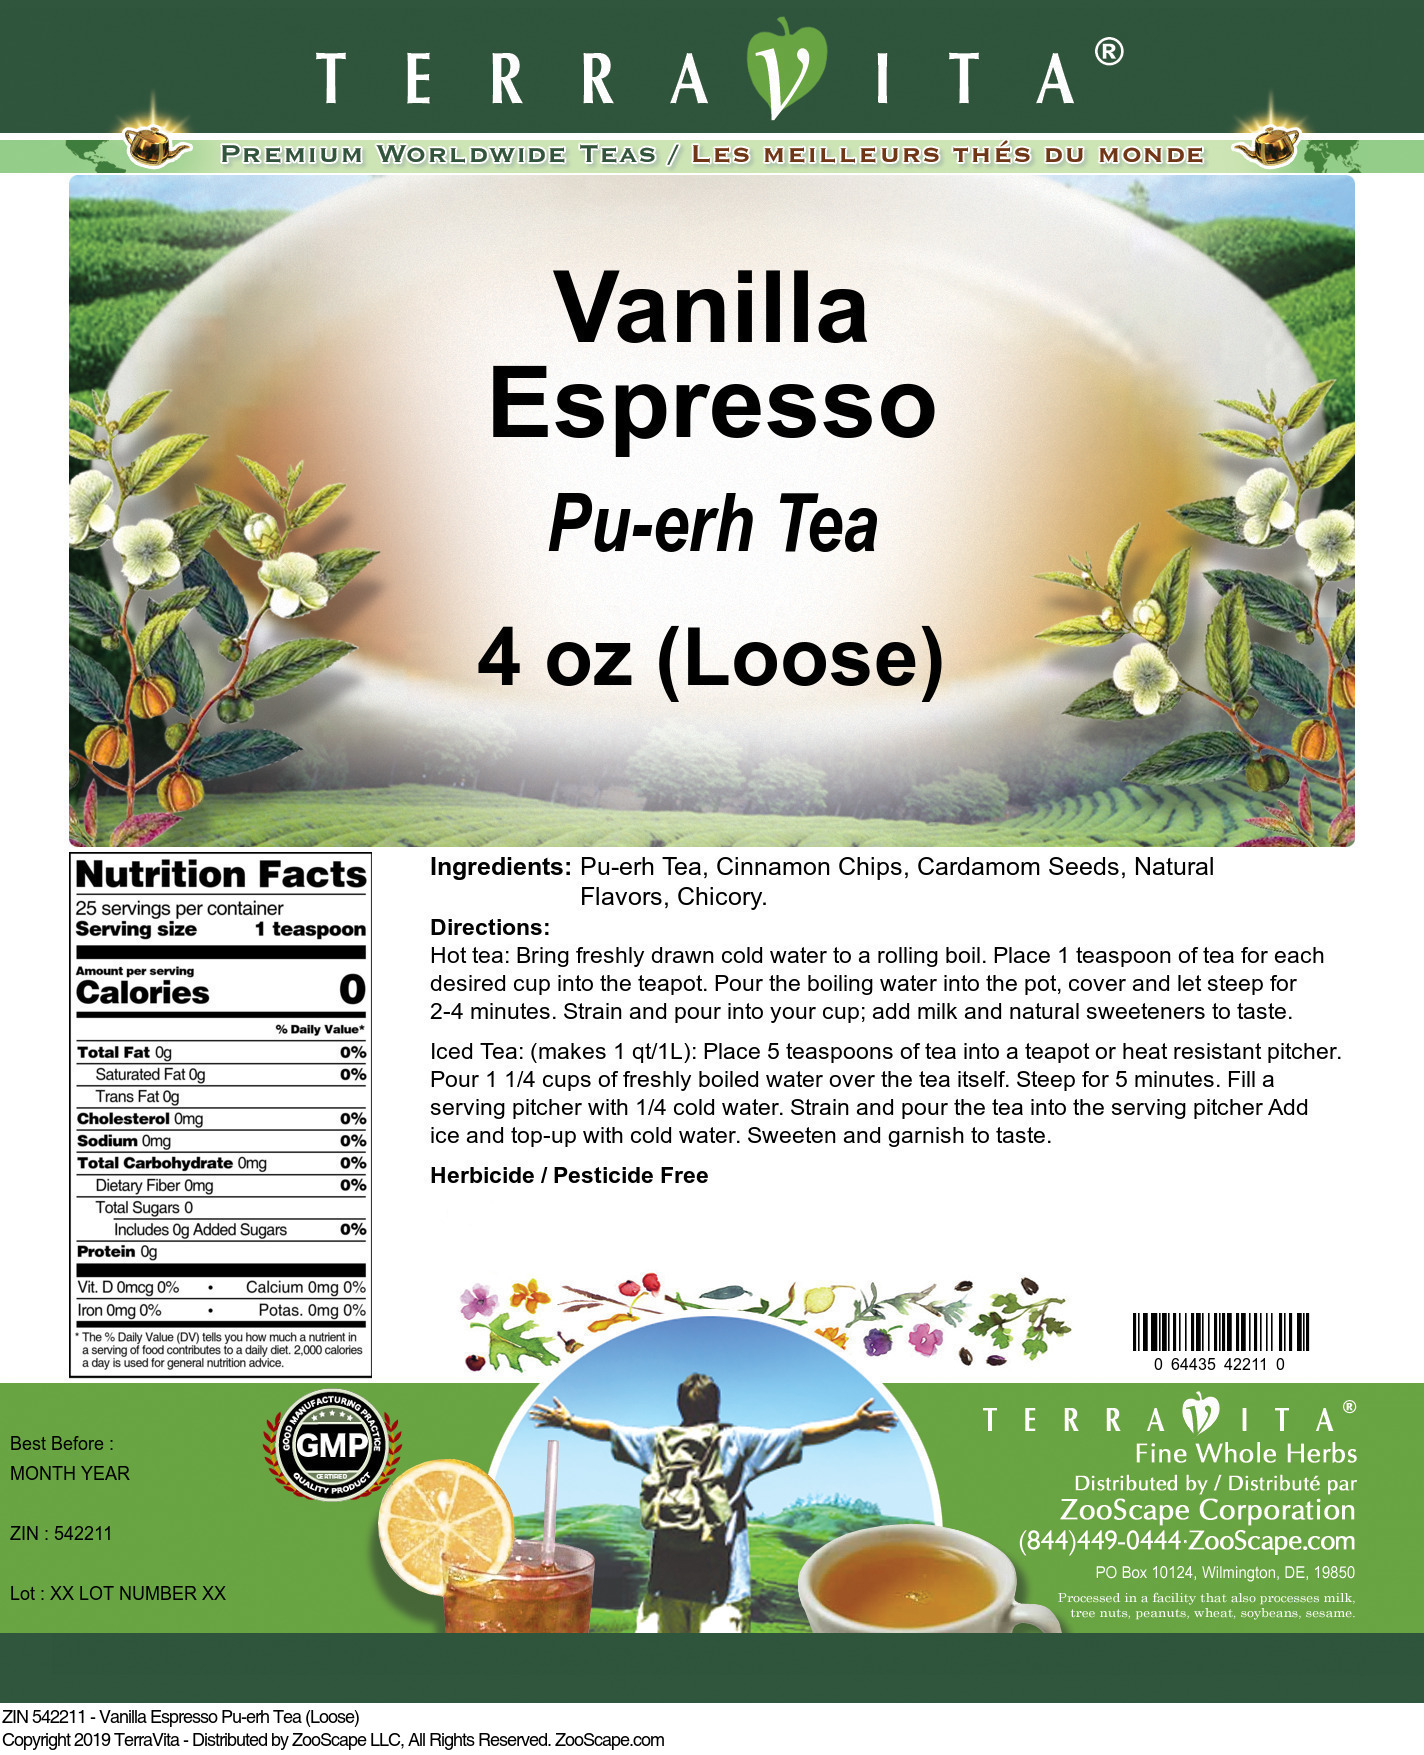 Vanilla Espresso Pu-erh Tea